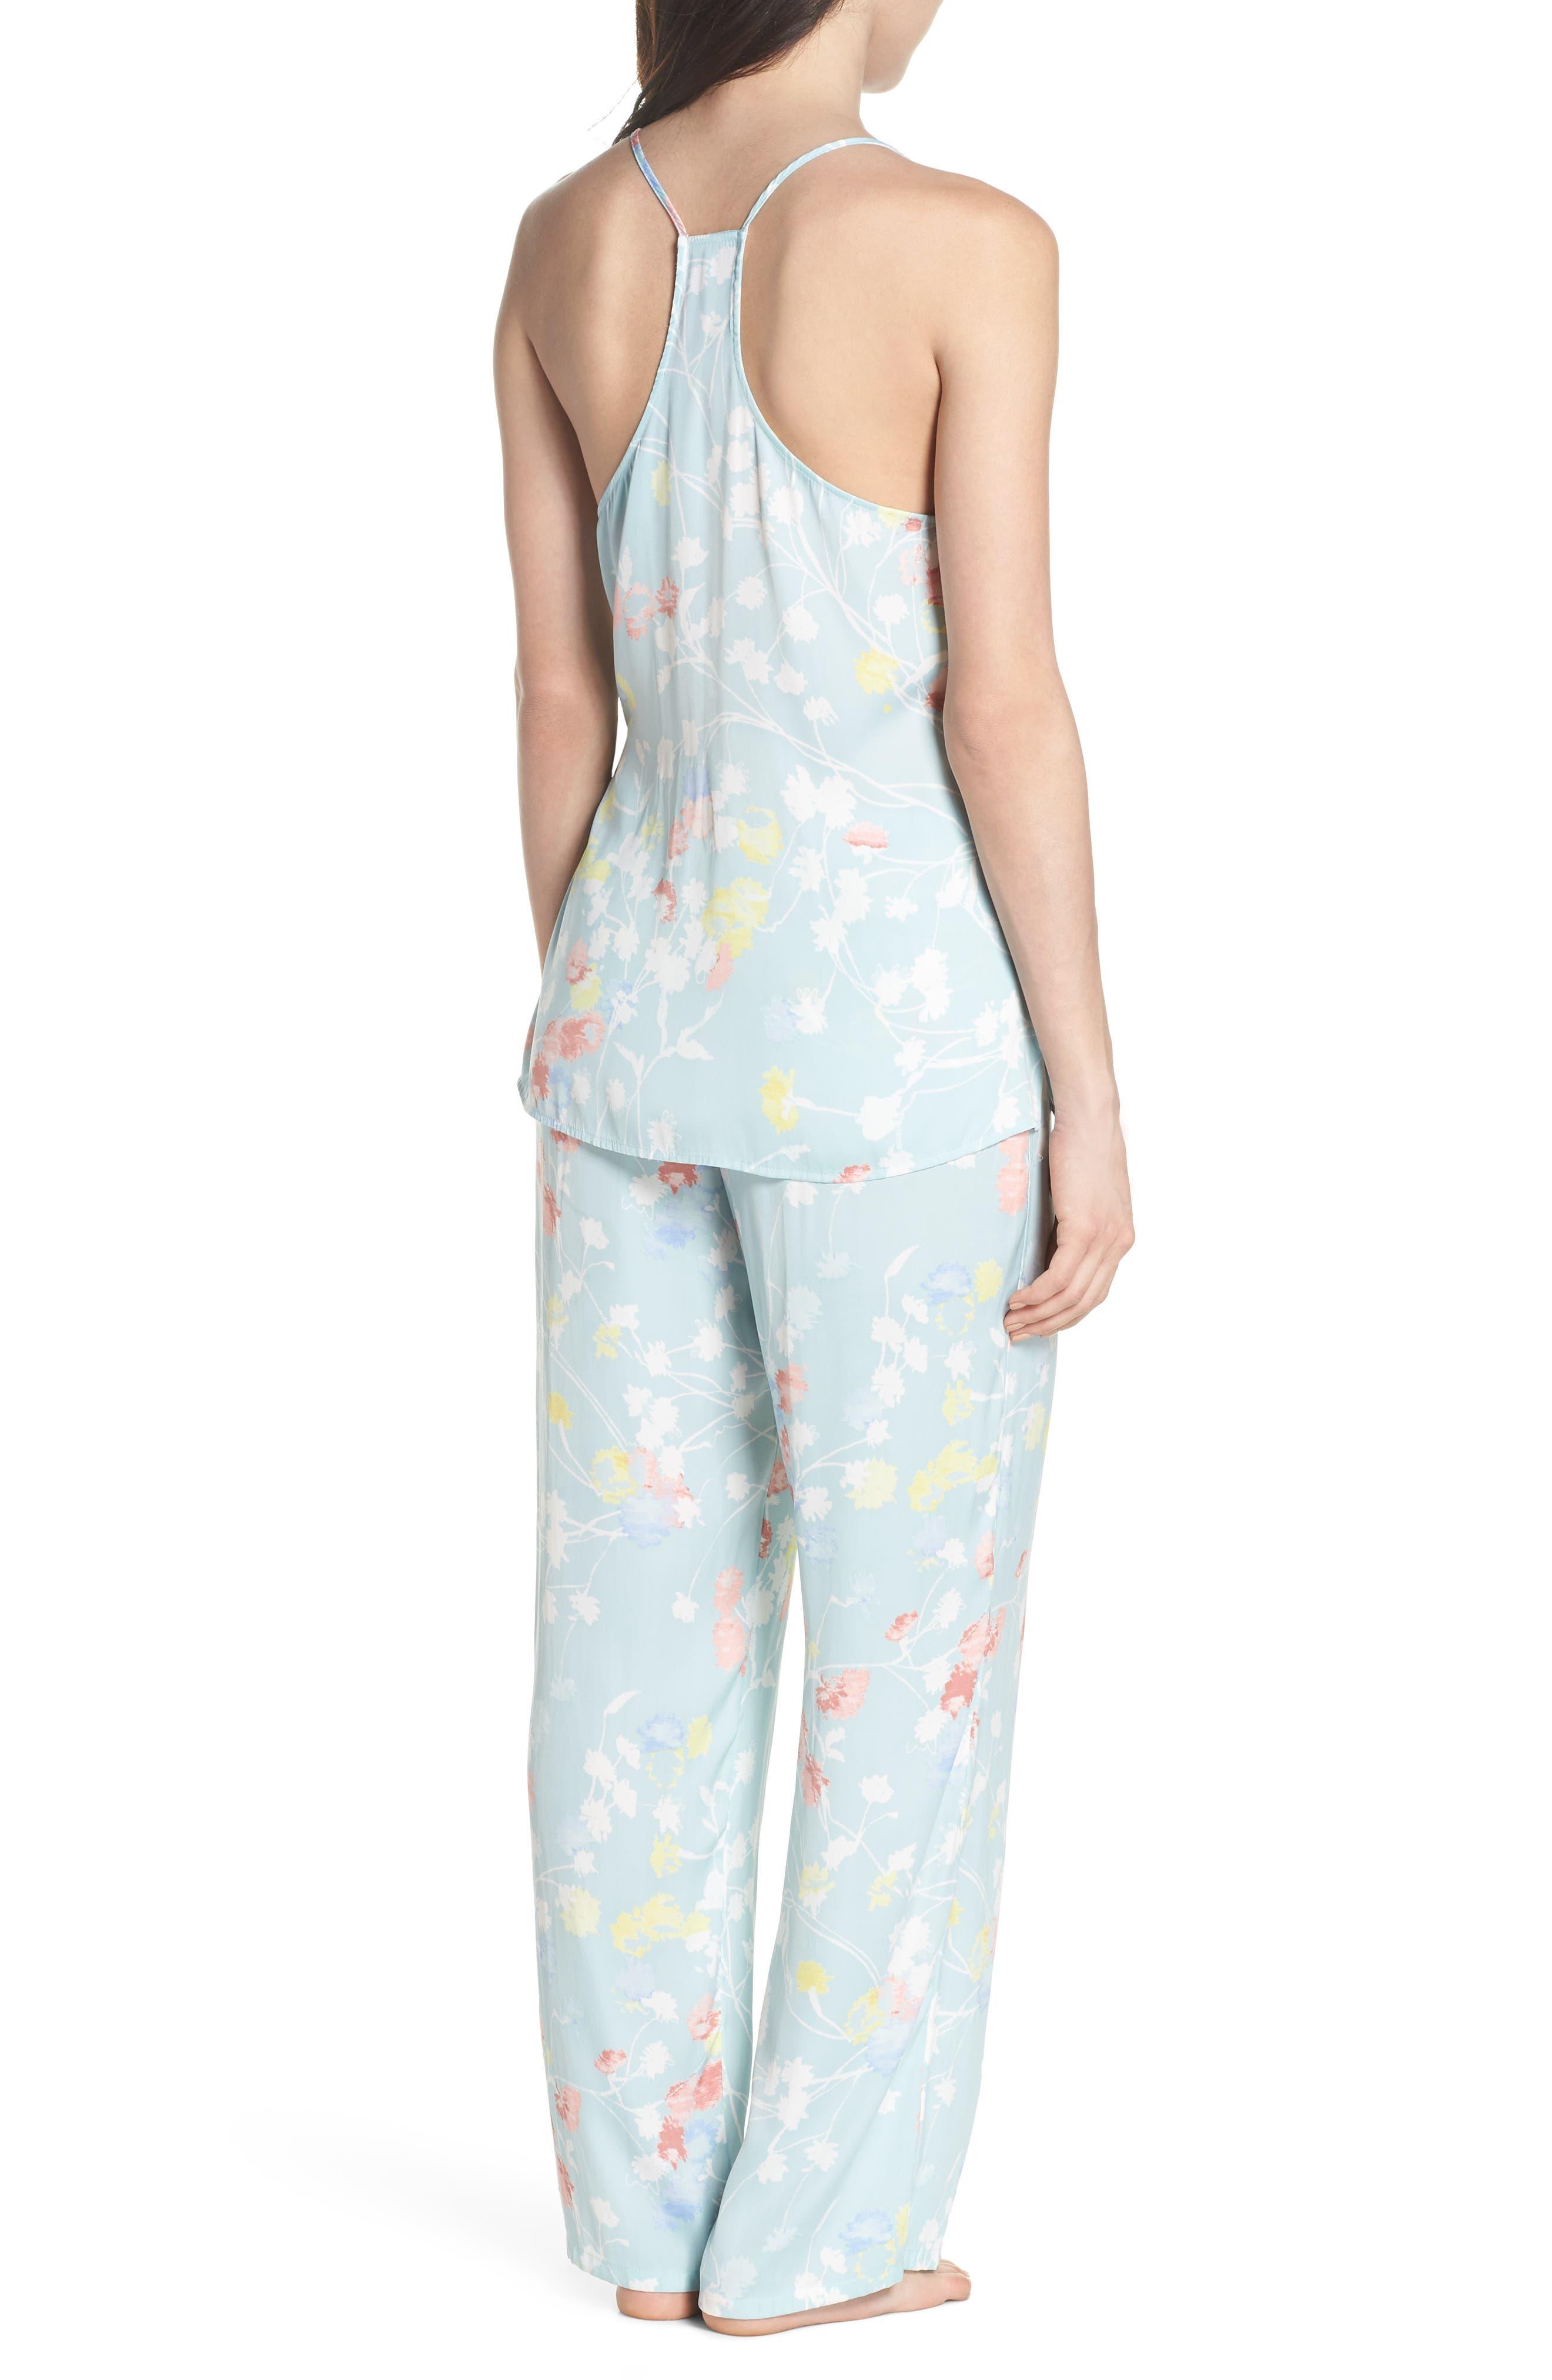 Bardot Dreamland Pajamas,                             Alternate thumbnail 2, color,                             Sgb Seaglass